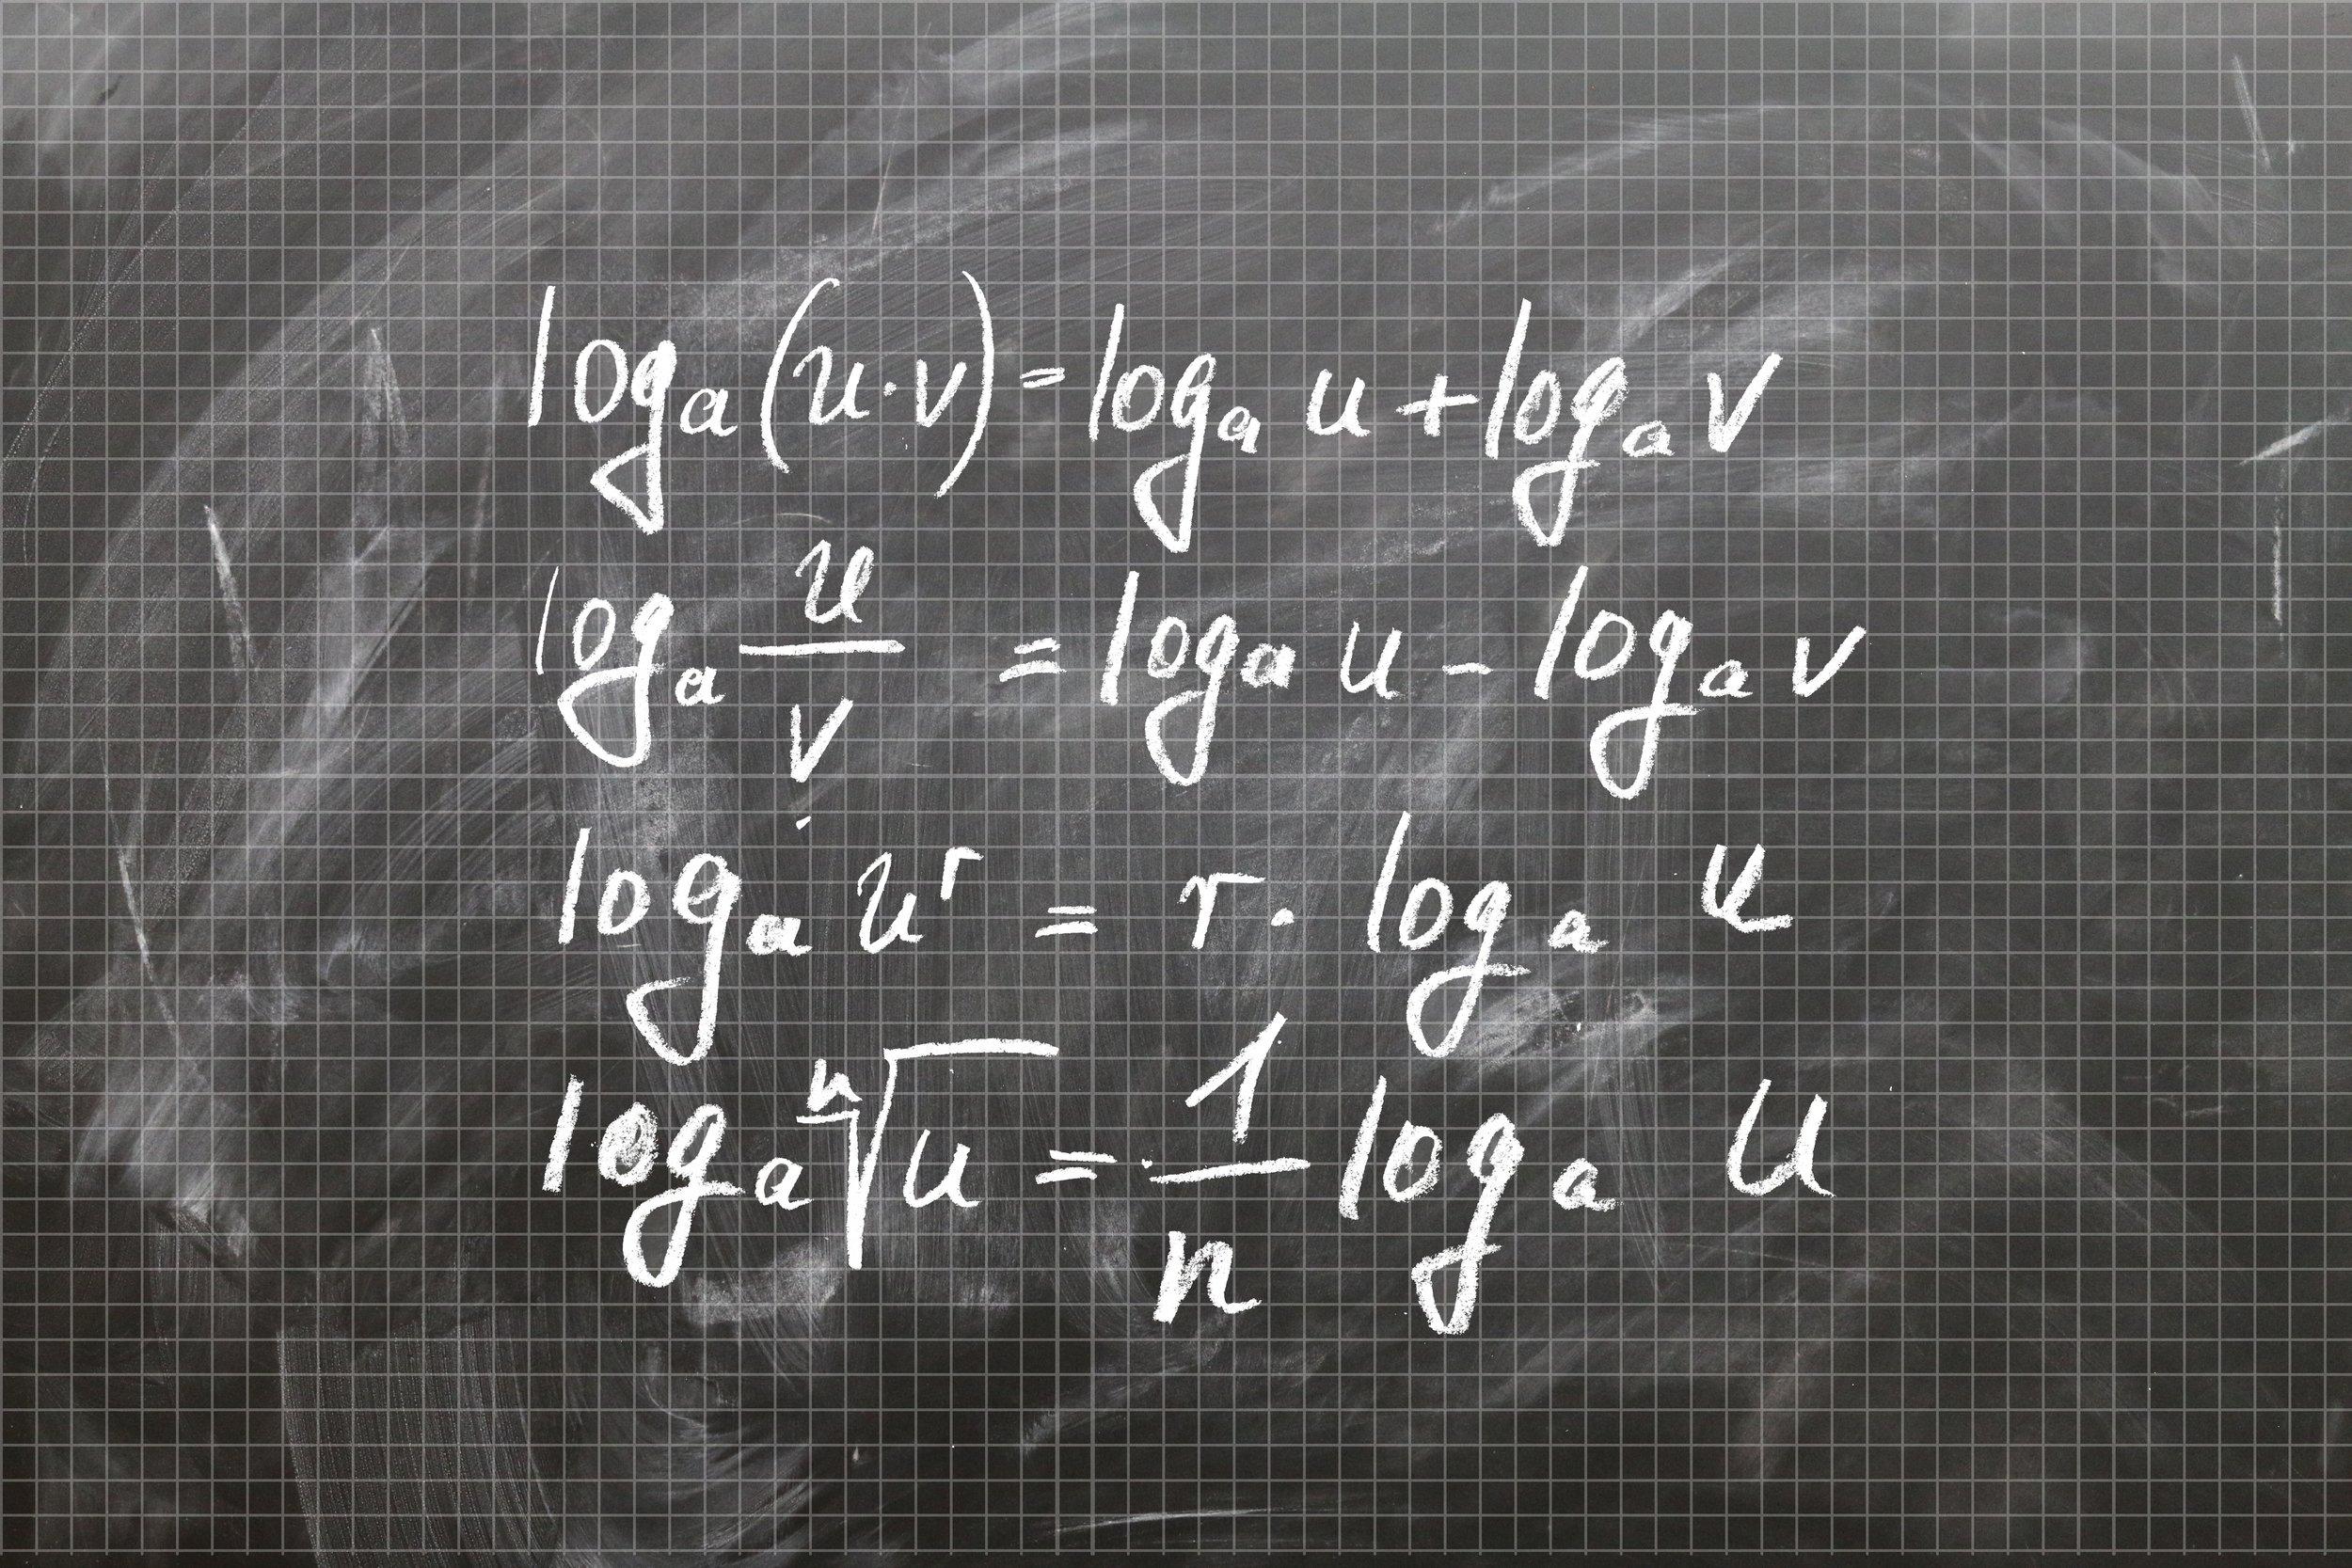 logarithm-1544756.jpg